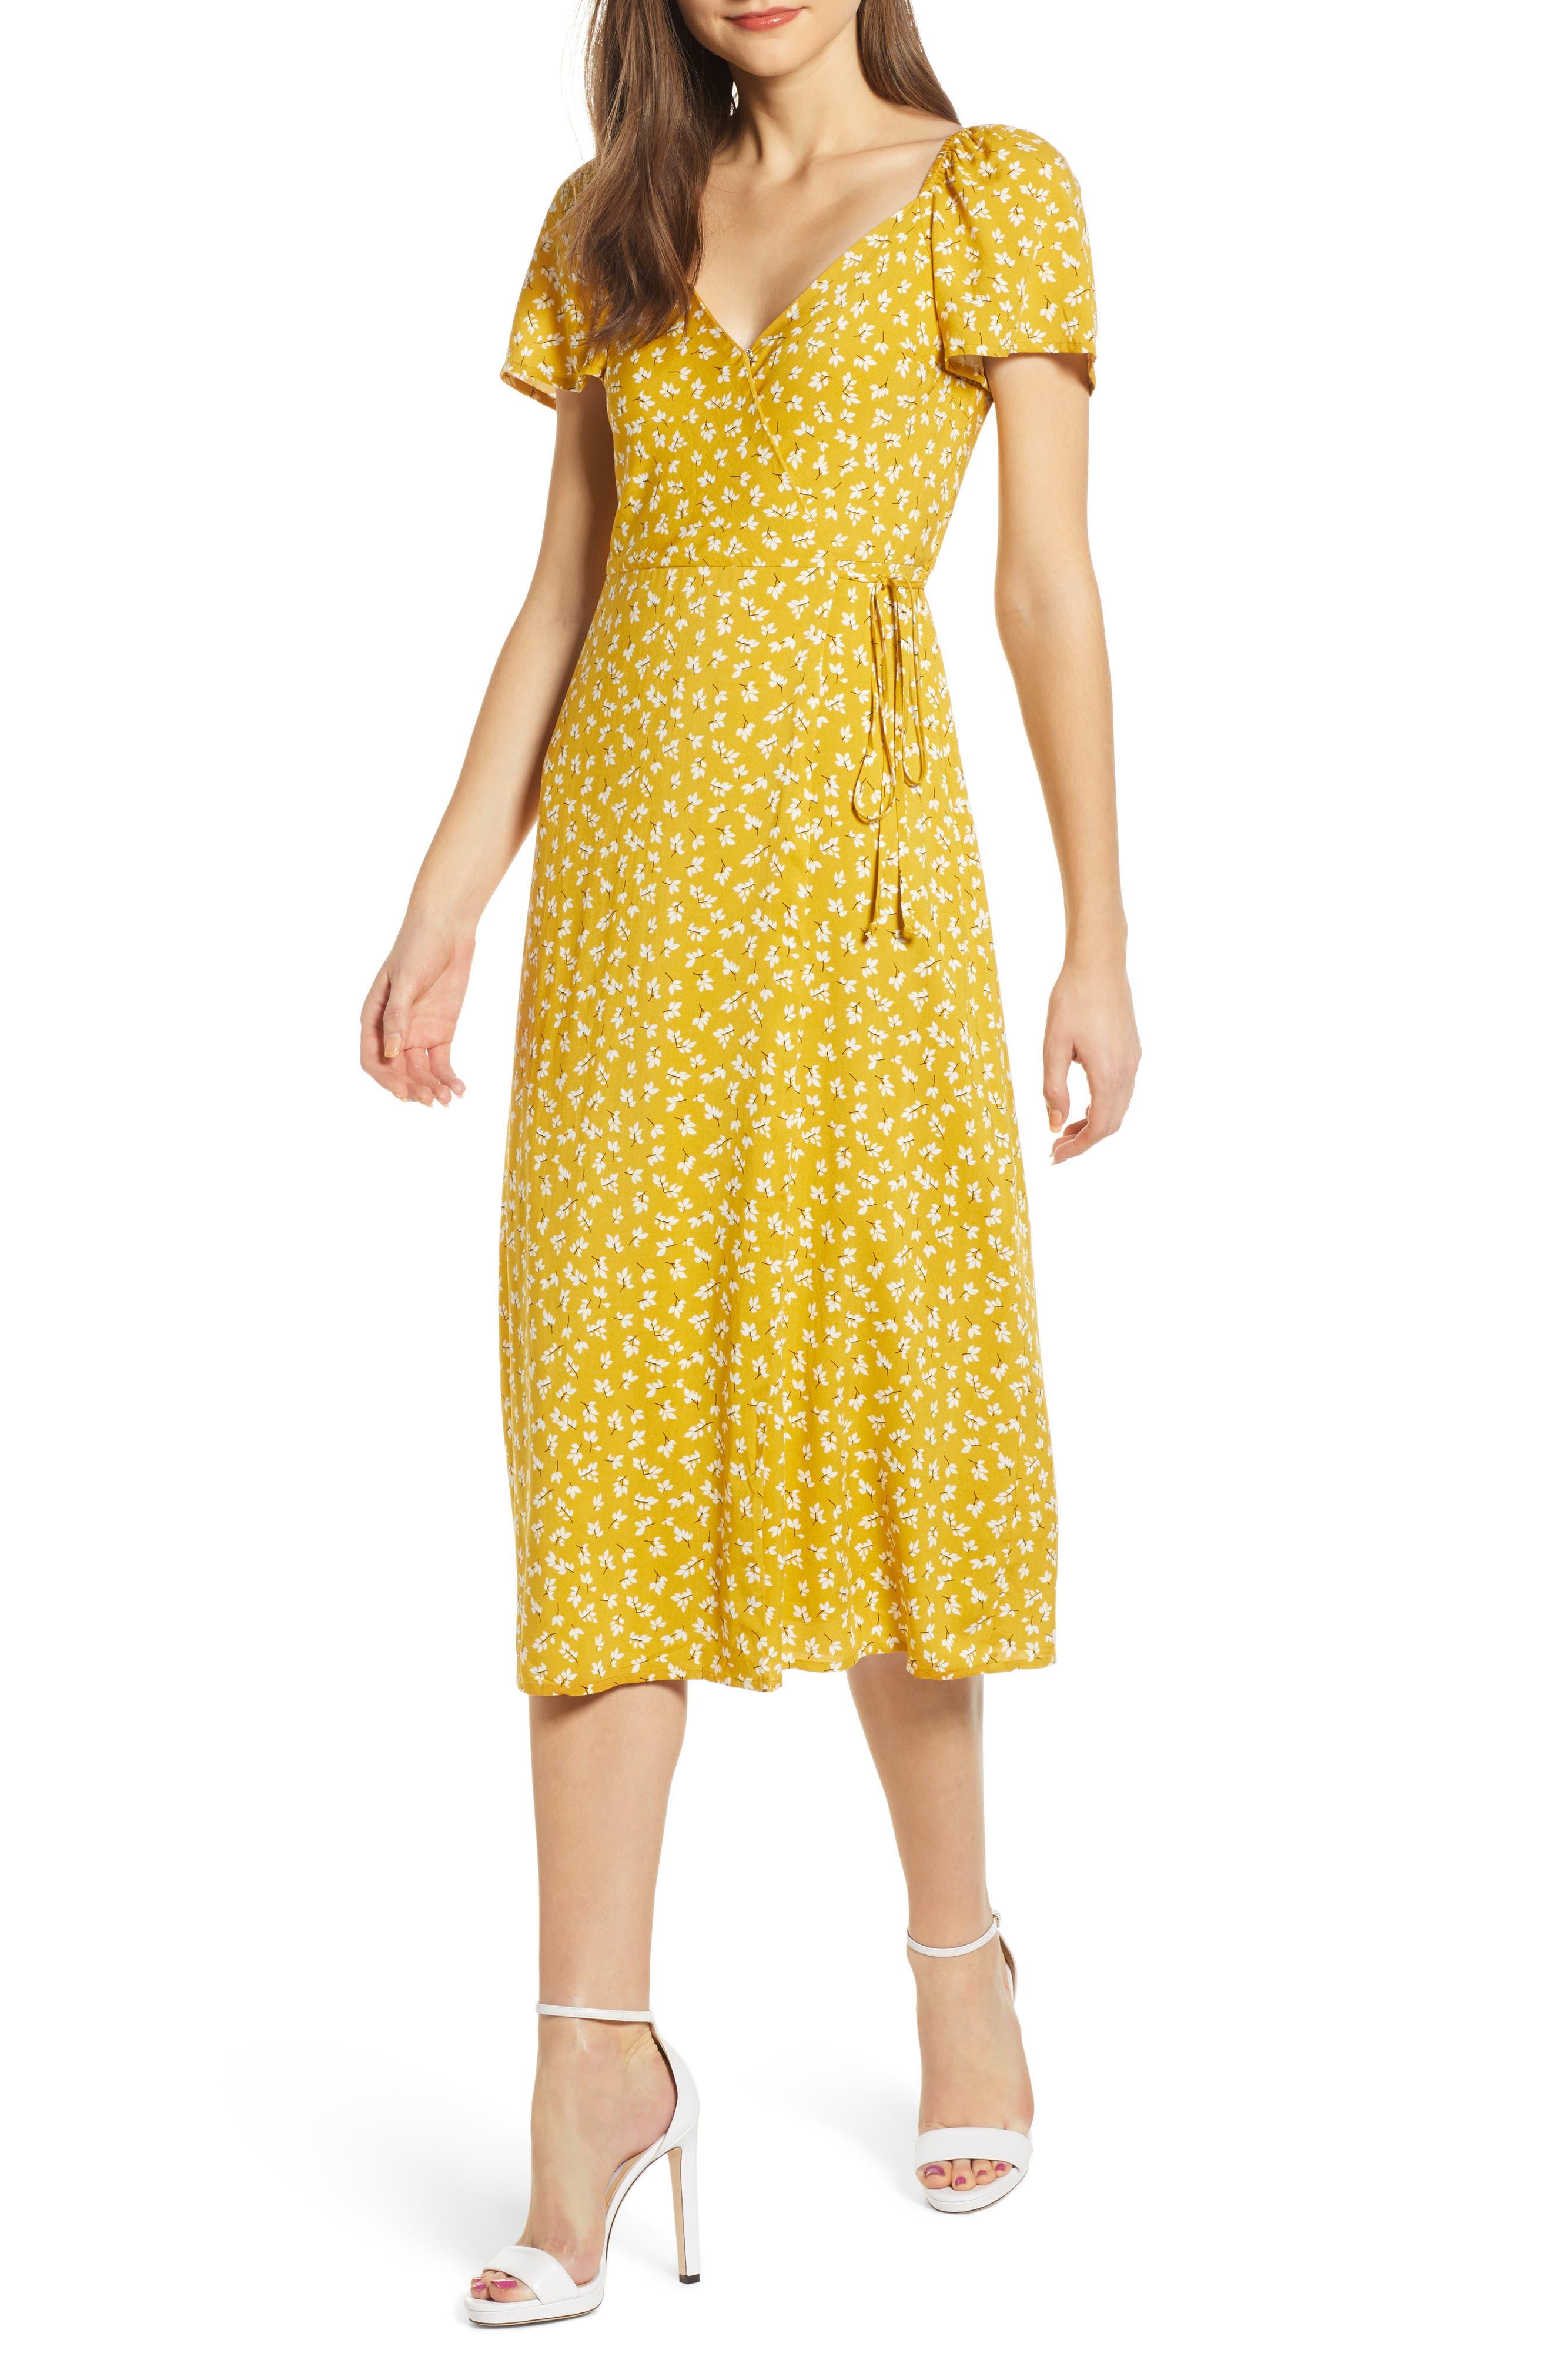 4Si3Nna Short Sleeve Wrap Dress, Yellow